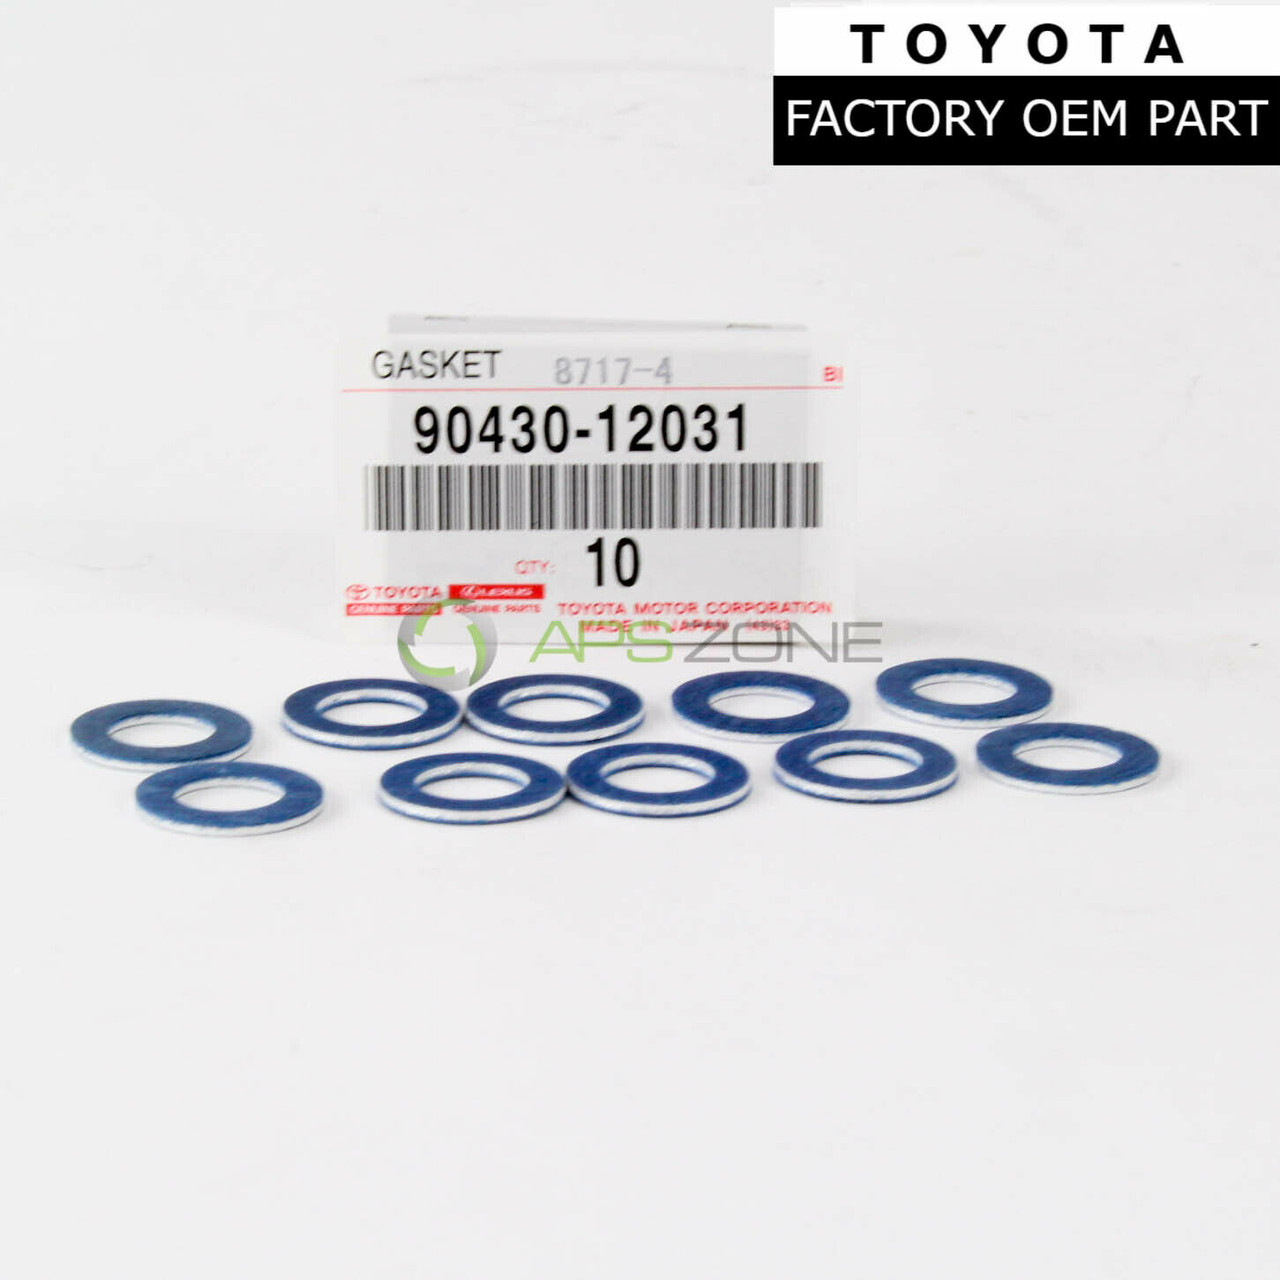 Genuine For Toyota Lexus Oil Drain Plug Washer Gasket Set Of 10 OEM 90430-12031